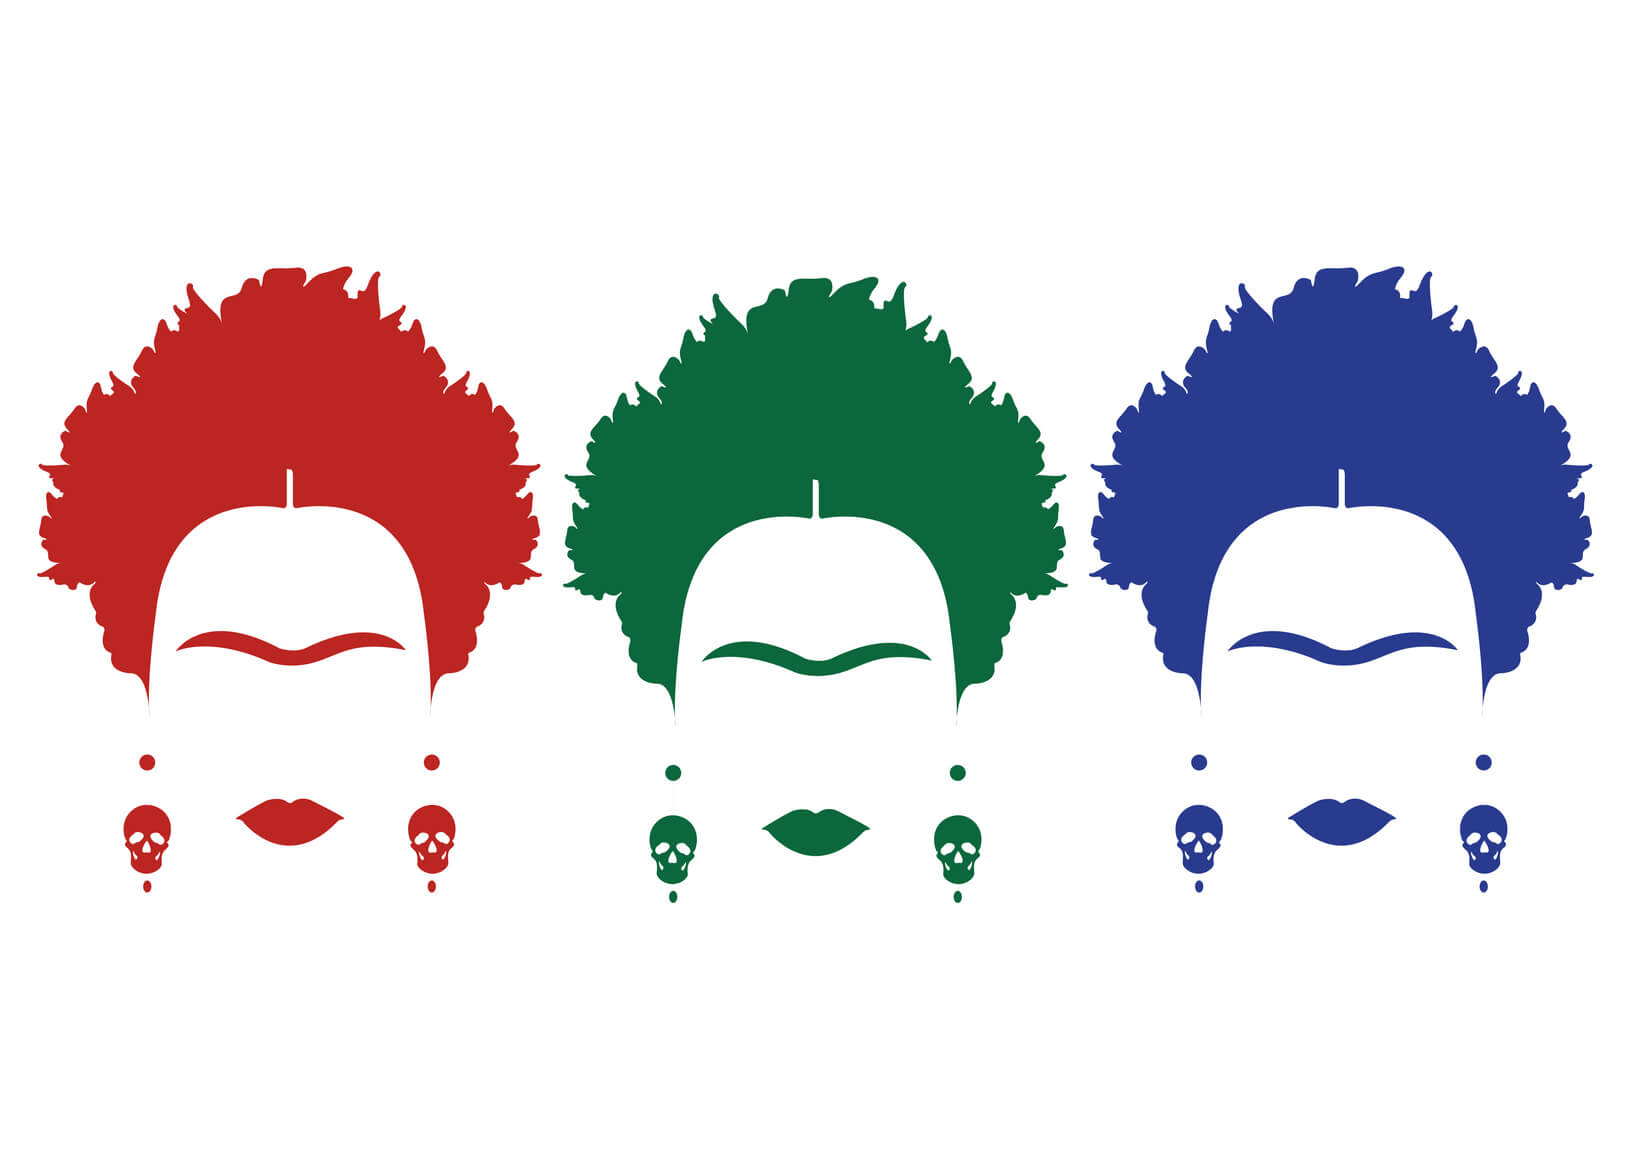 Imagenes De Frida Kahlo Animada Para Colorear: Dibujos De Frida Kahlo Animados